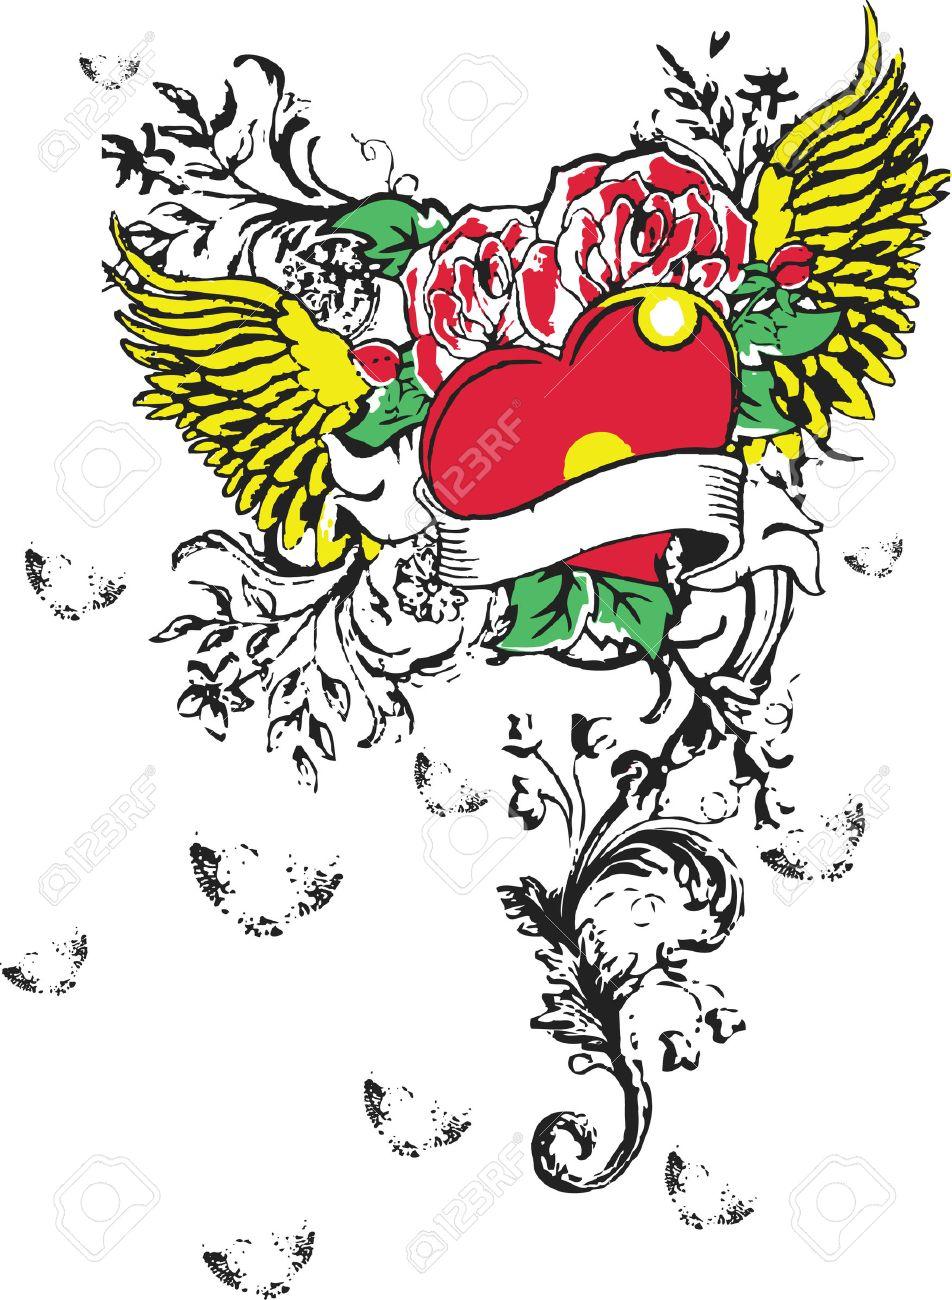 Gothic Heart Tattoos Gothic heart tattoo (graffiti)